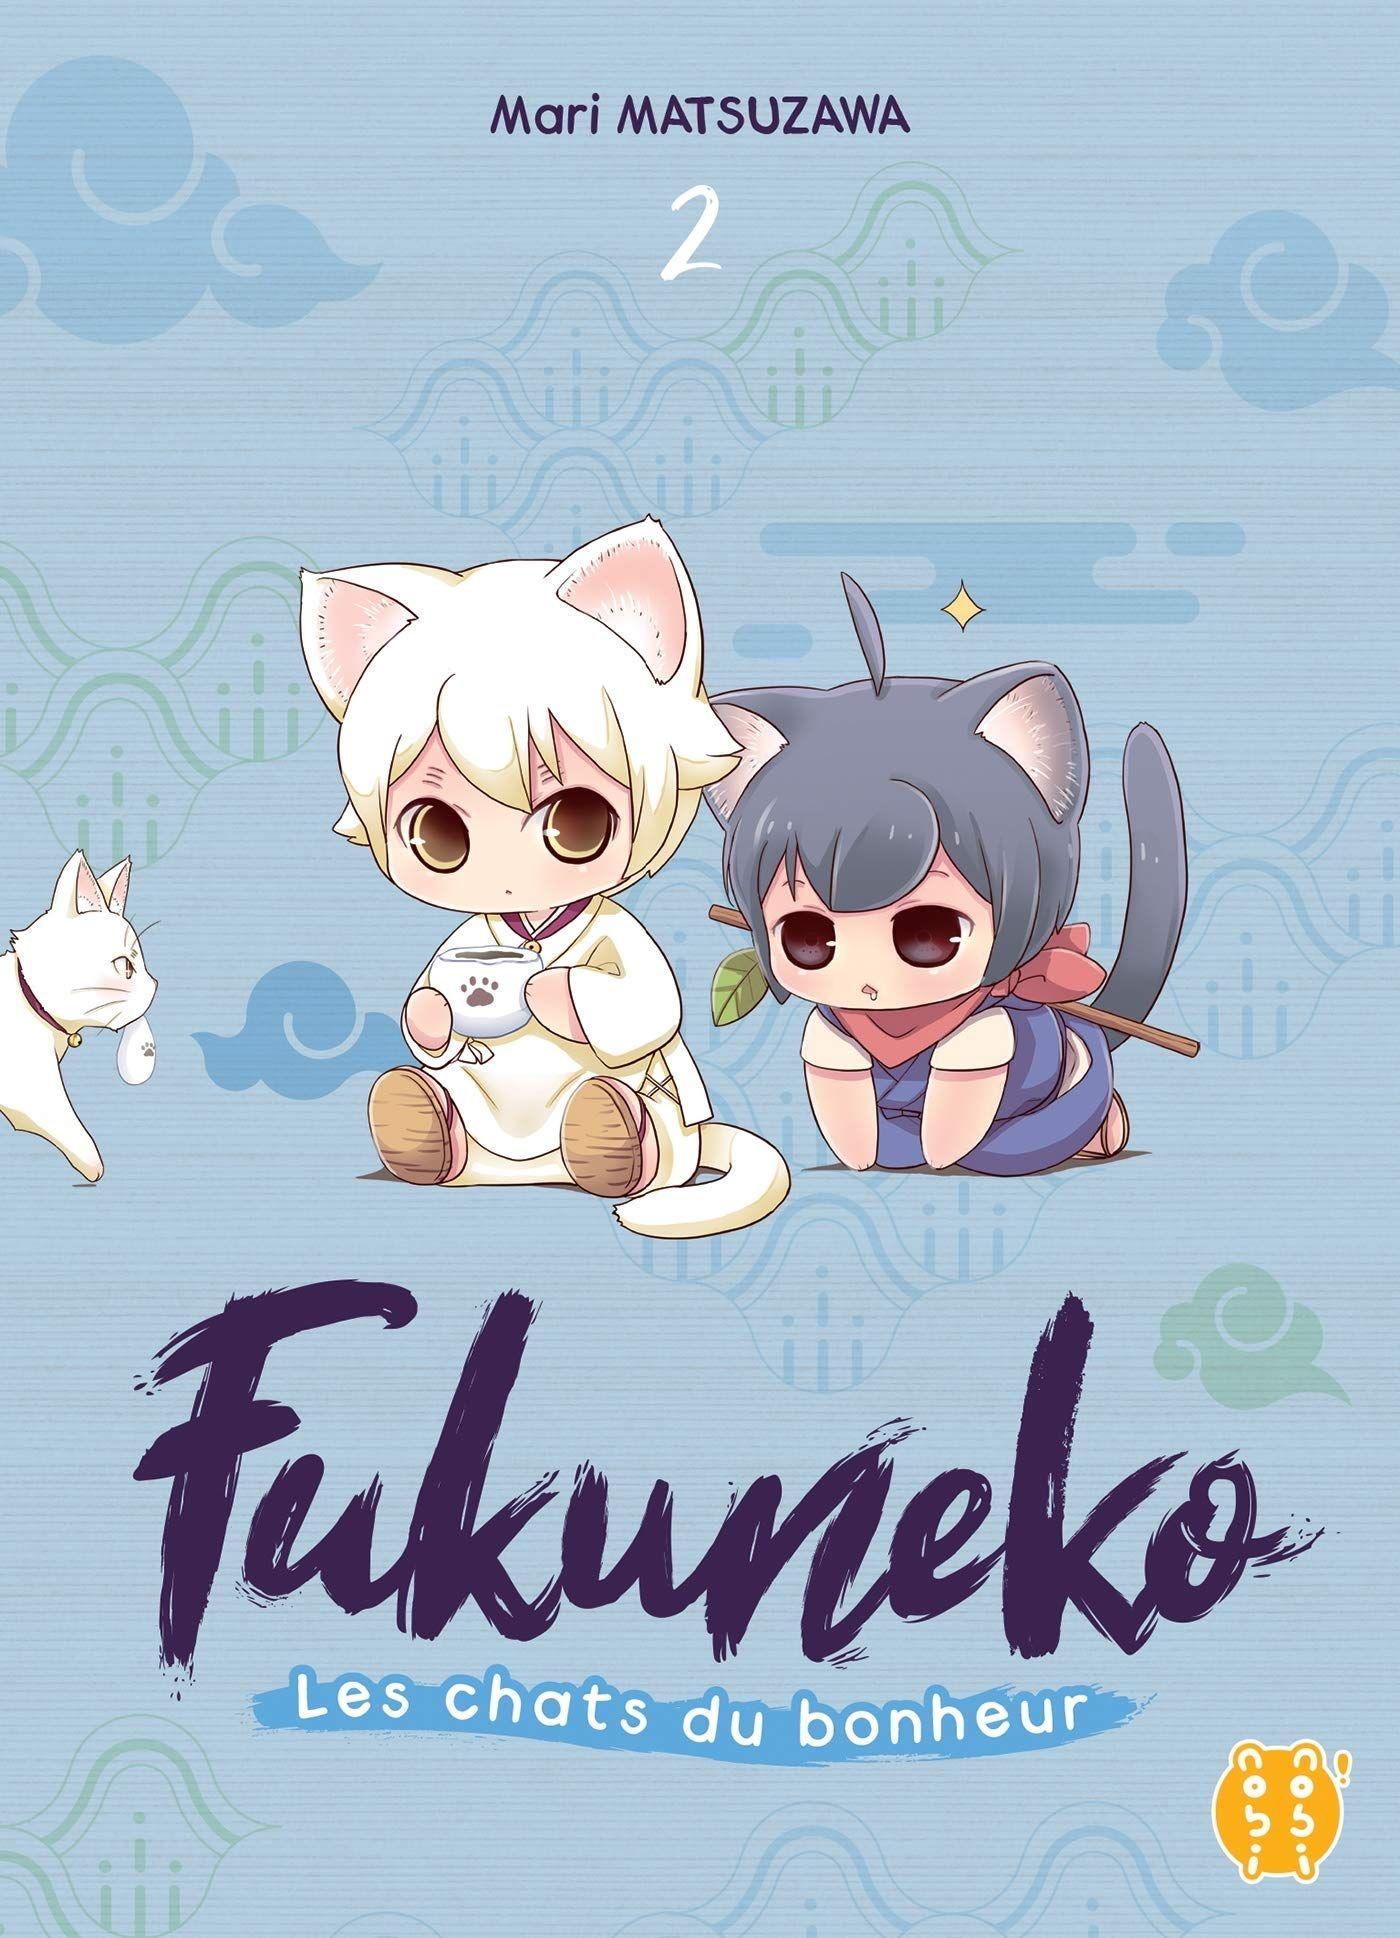 Manga - Manhwa - Fukuneko - Les chats du bonheur Vol.2